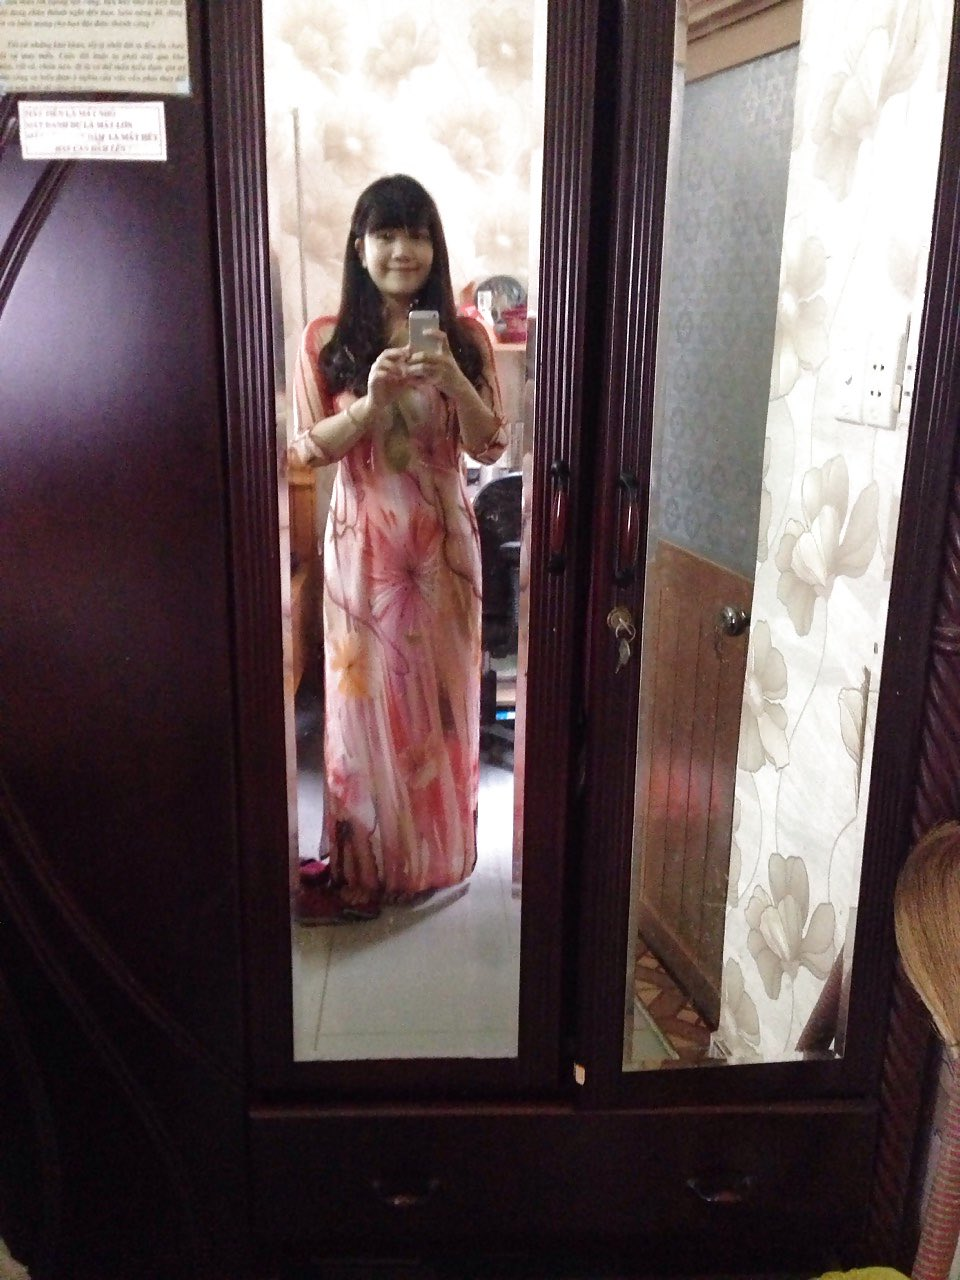 janda kembang selfie depan kaca bugil hot 2017